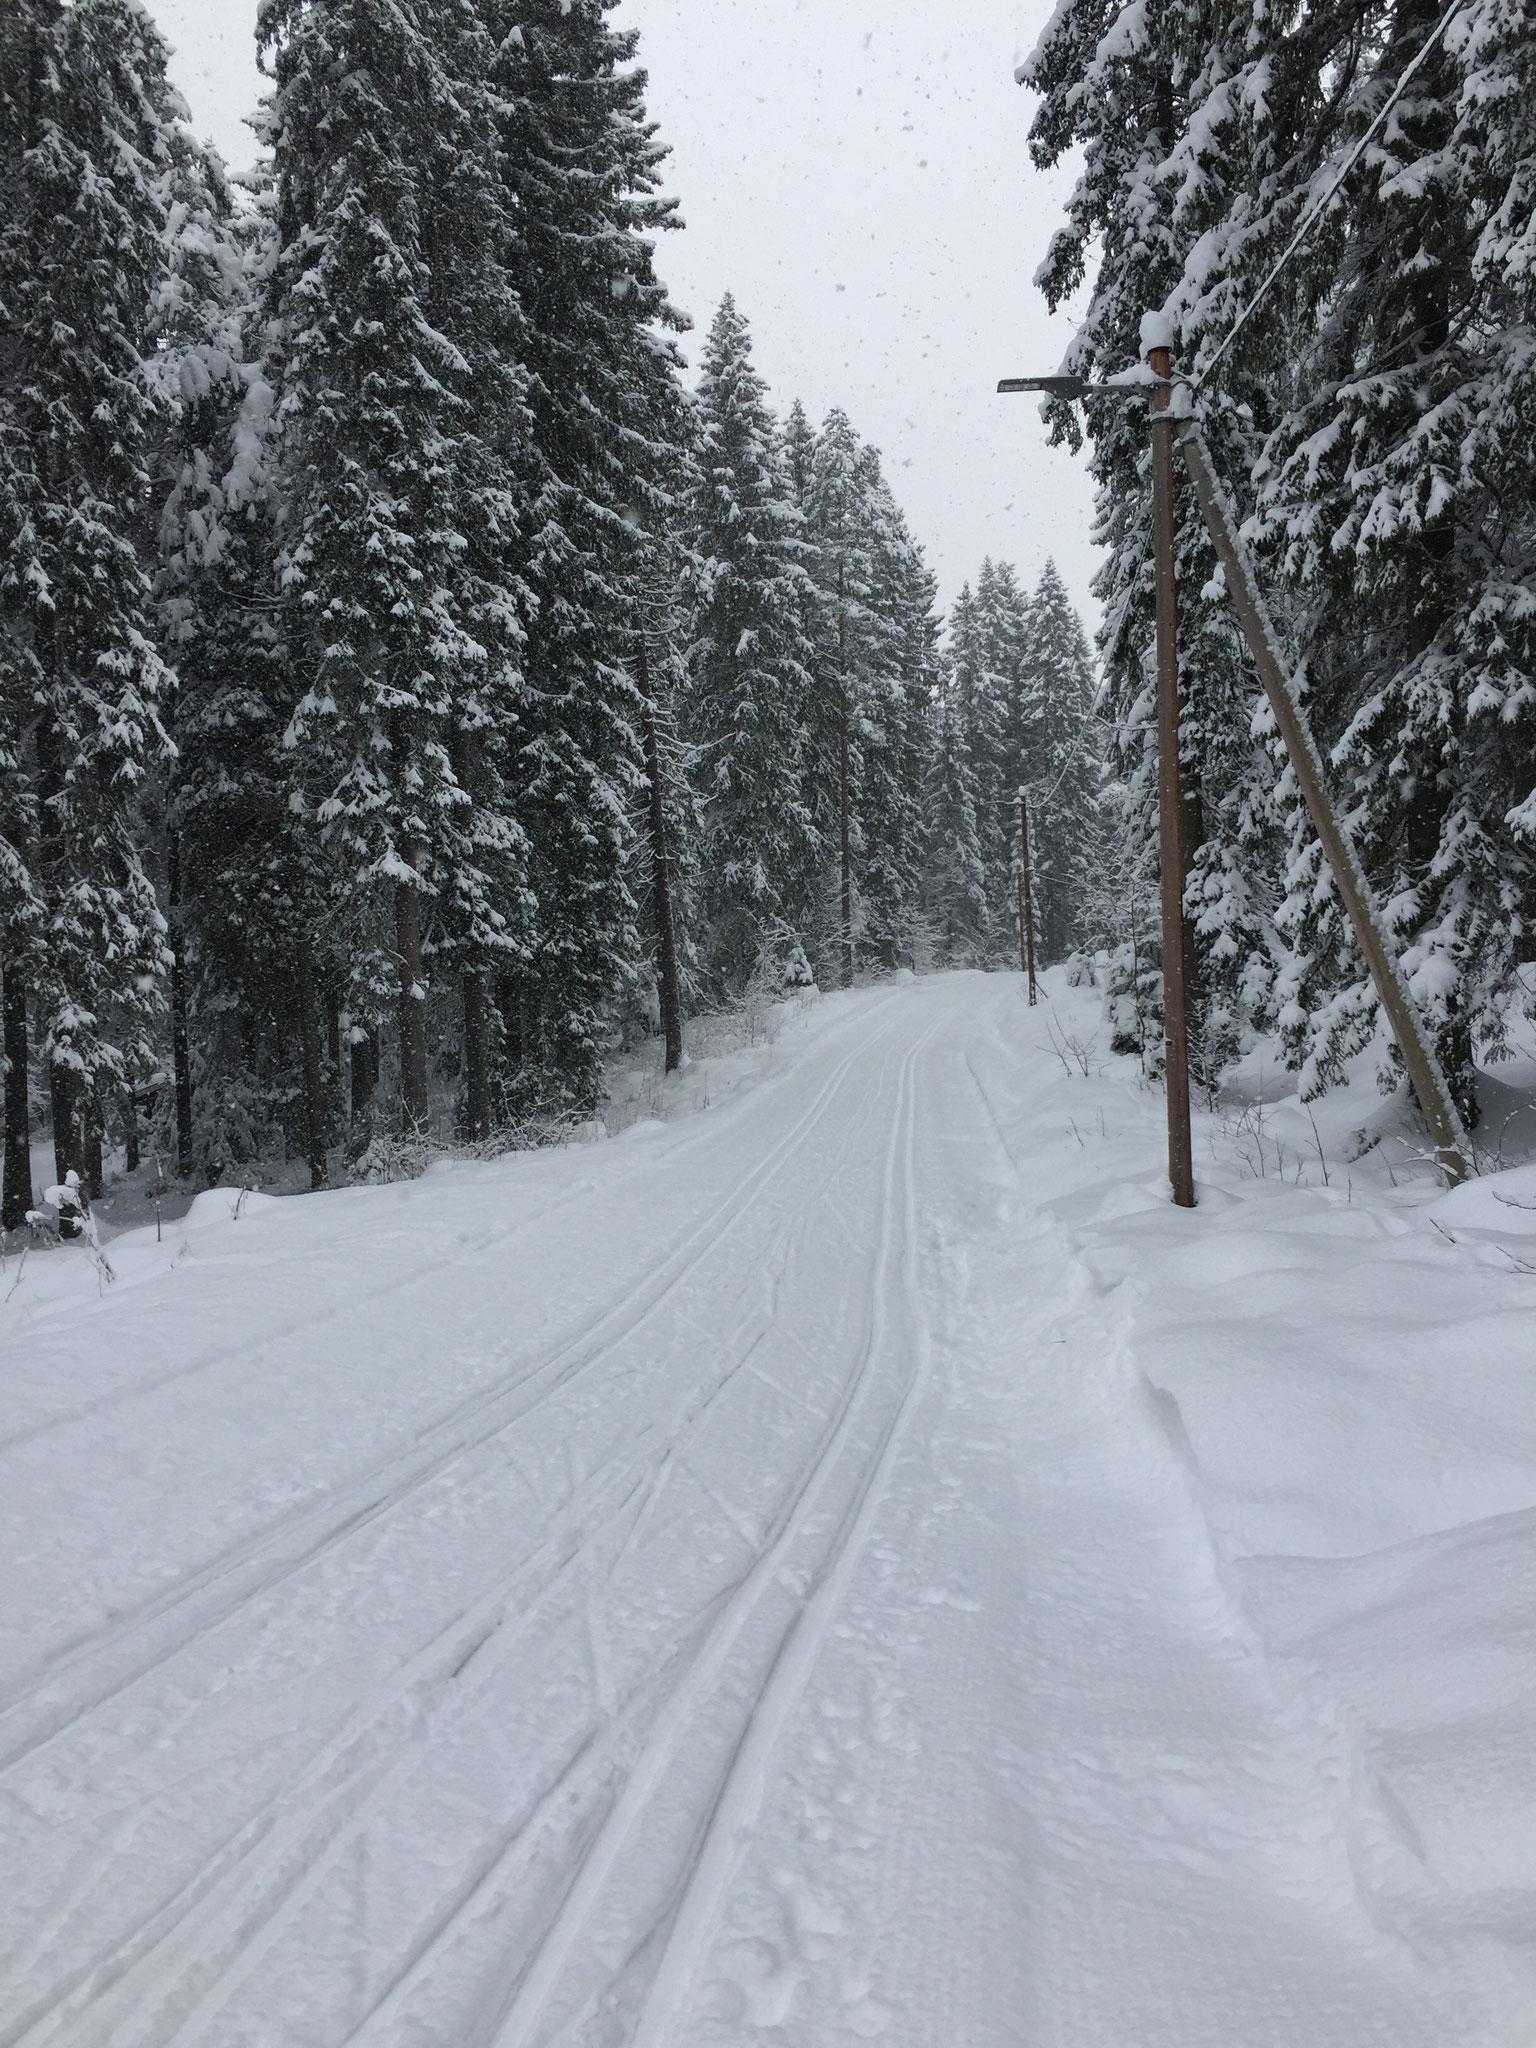 Skistrecken direkt in Oslo